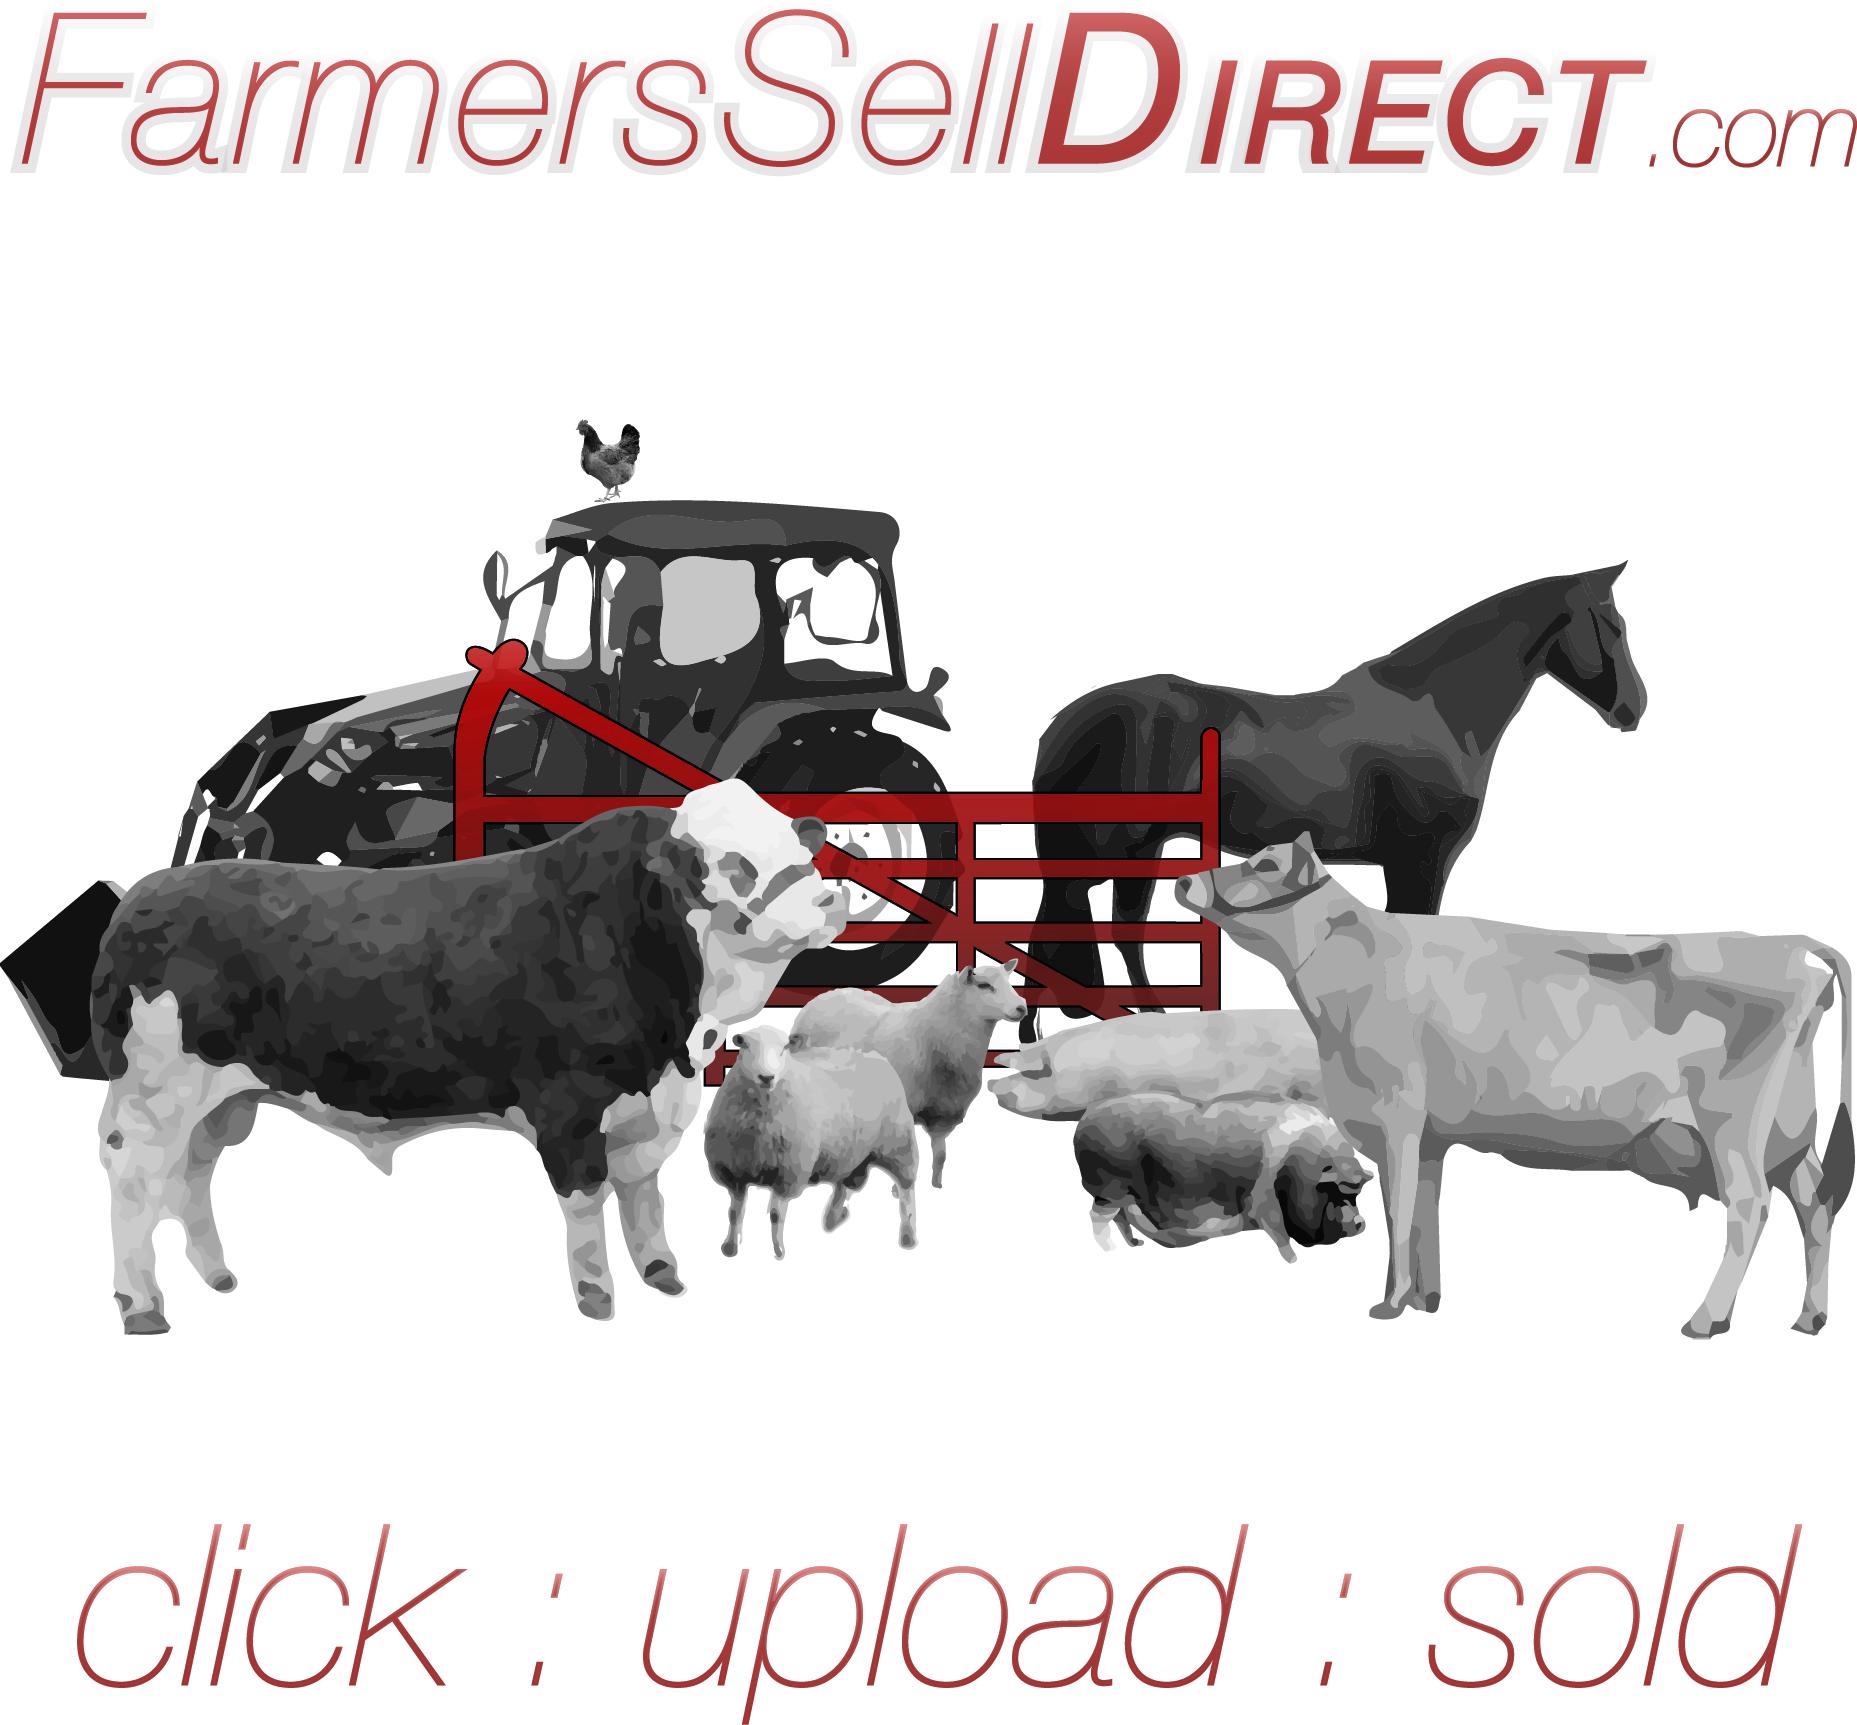 FarmersSell Direct